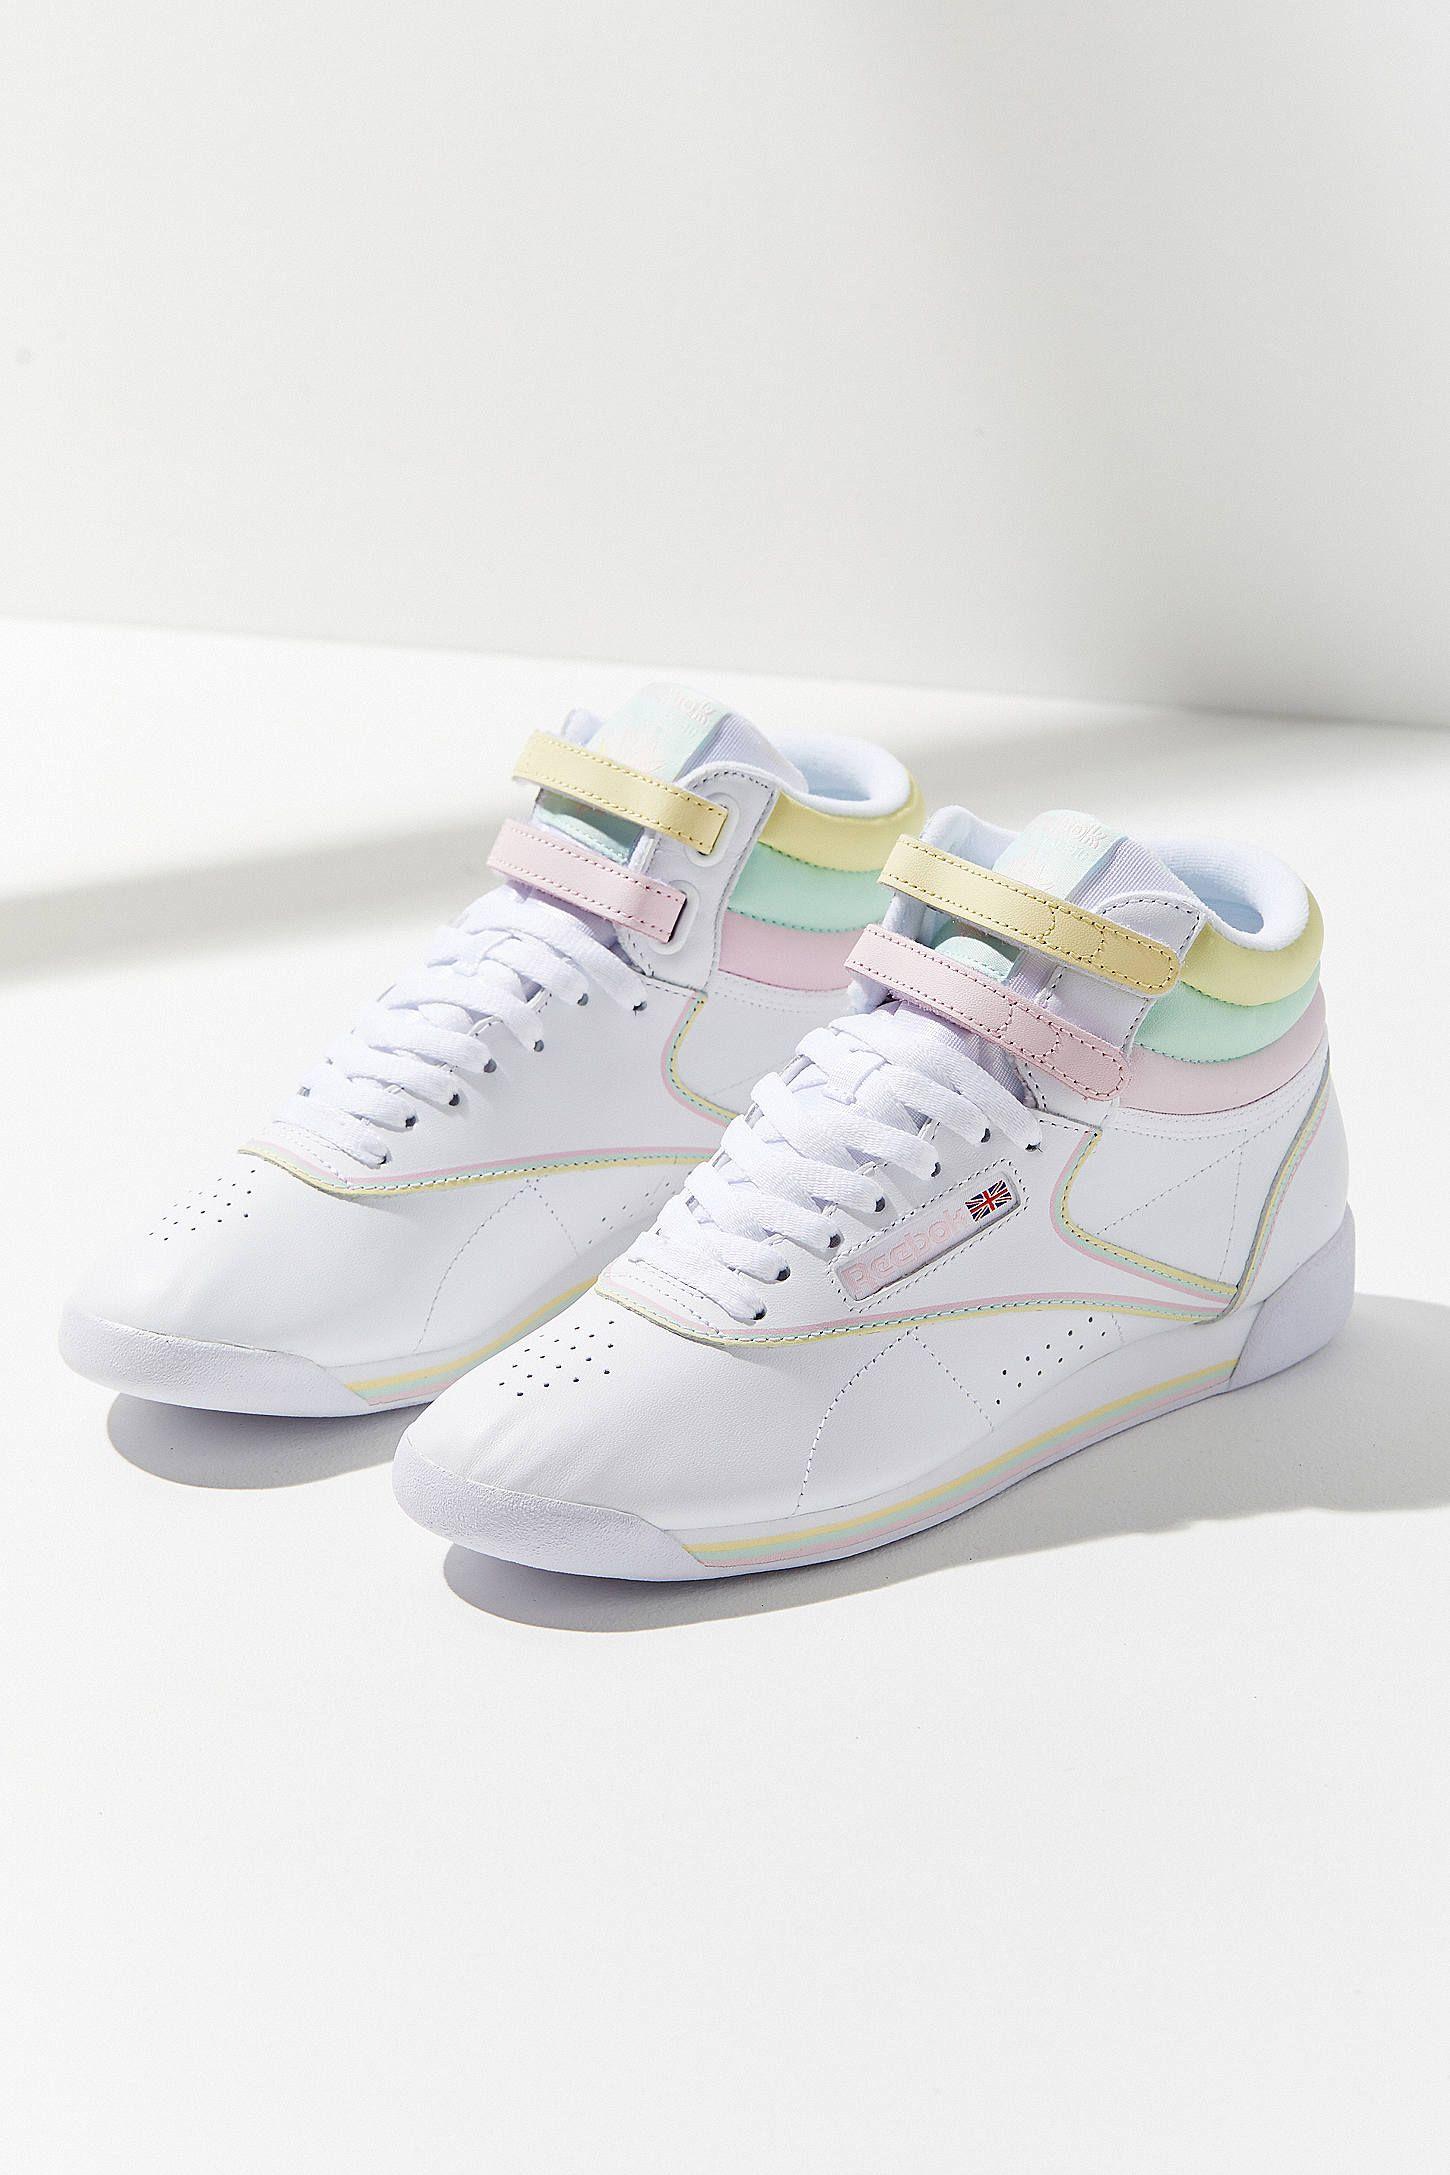 619409014e0 reebok x glow freestyle hi pastel sneaker off 53% - www.gervez ...